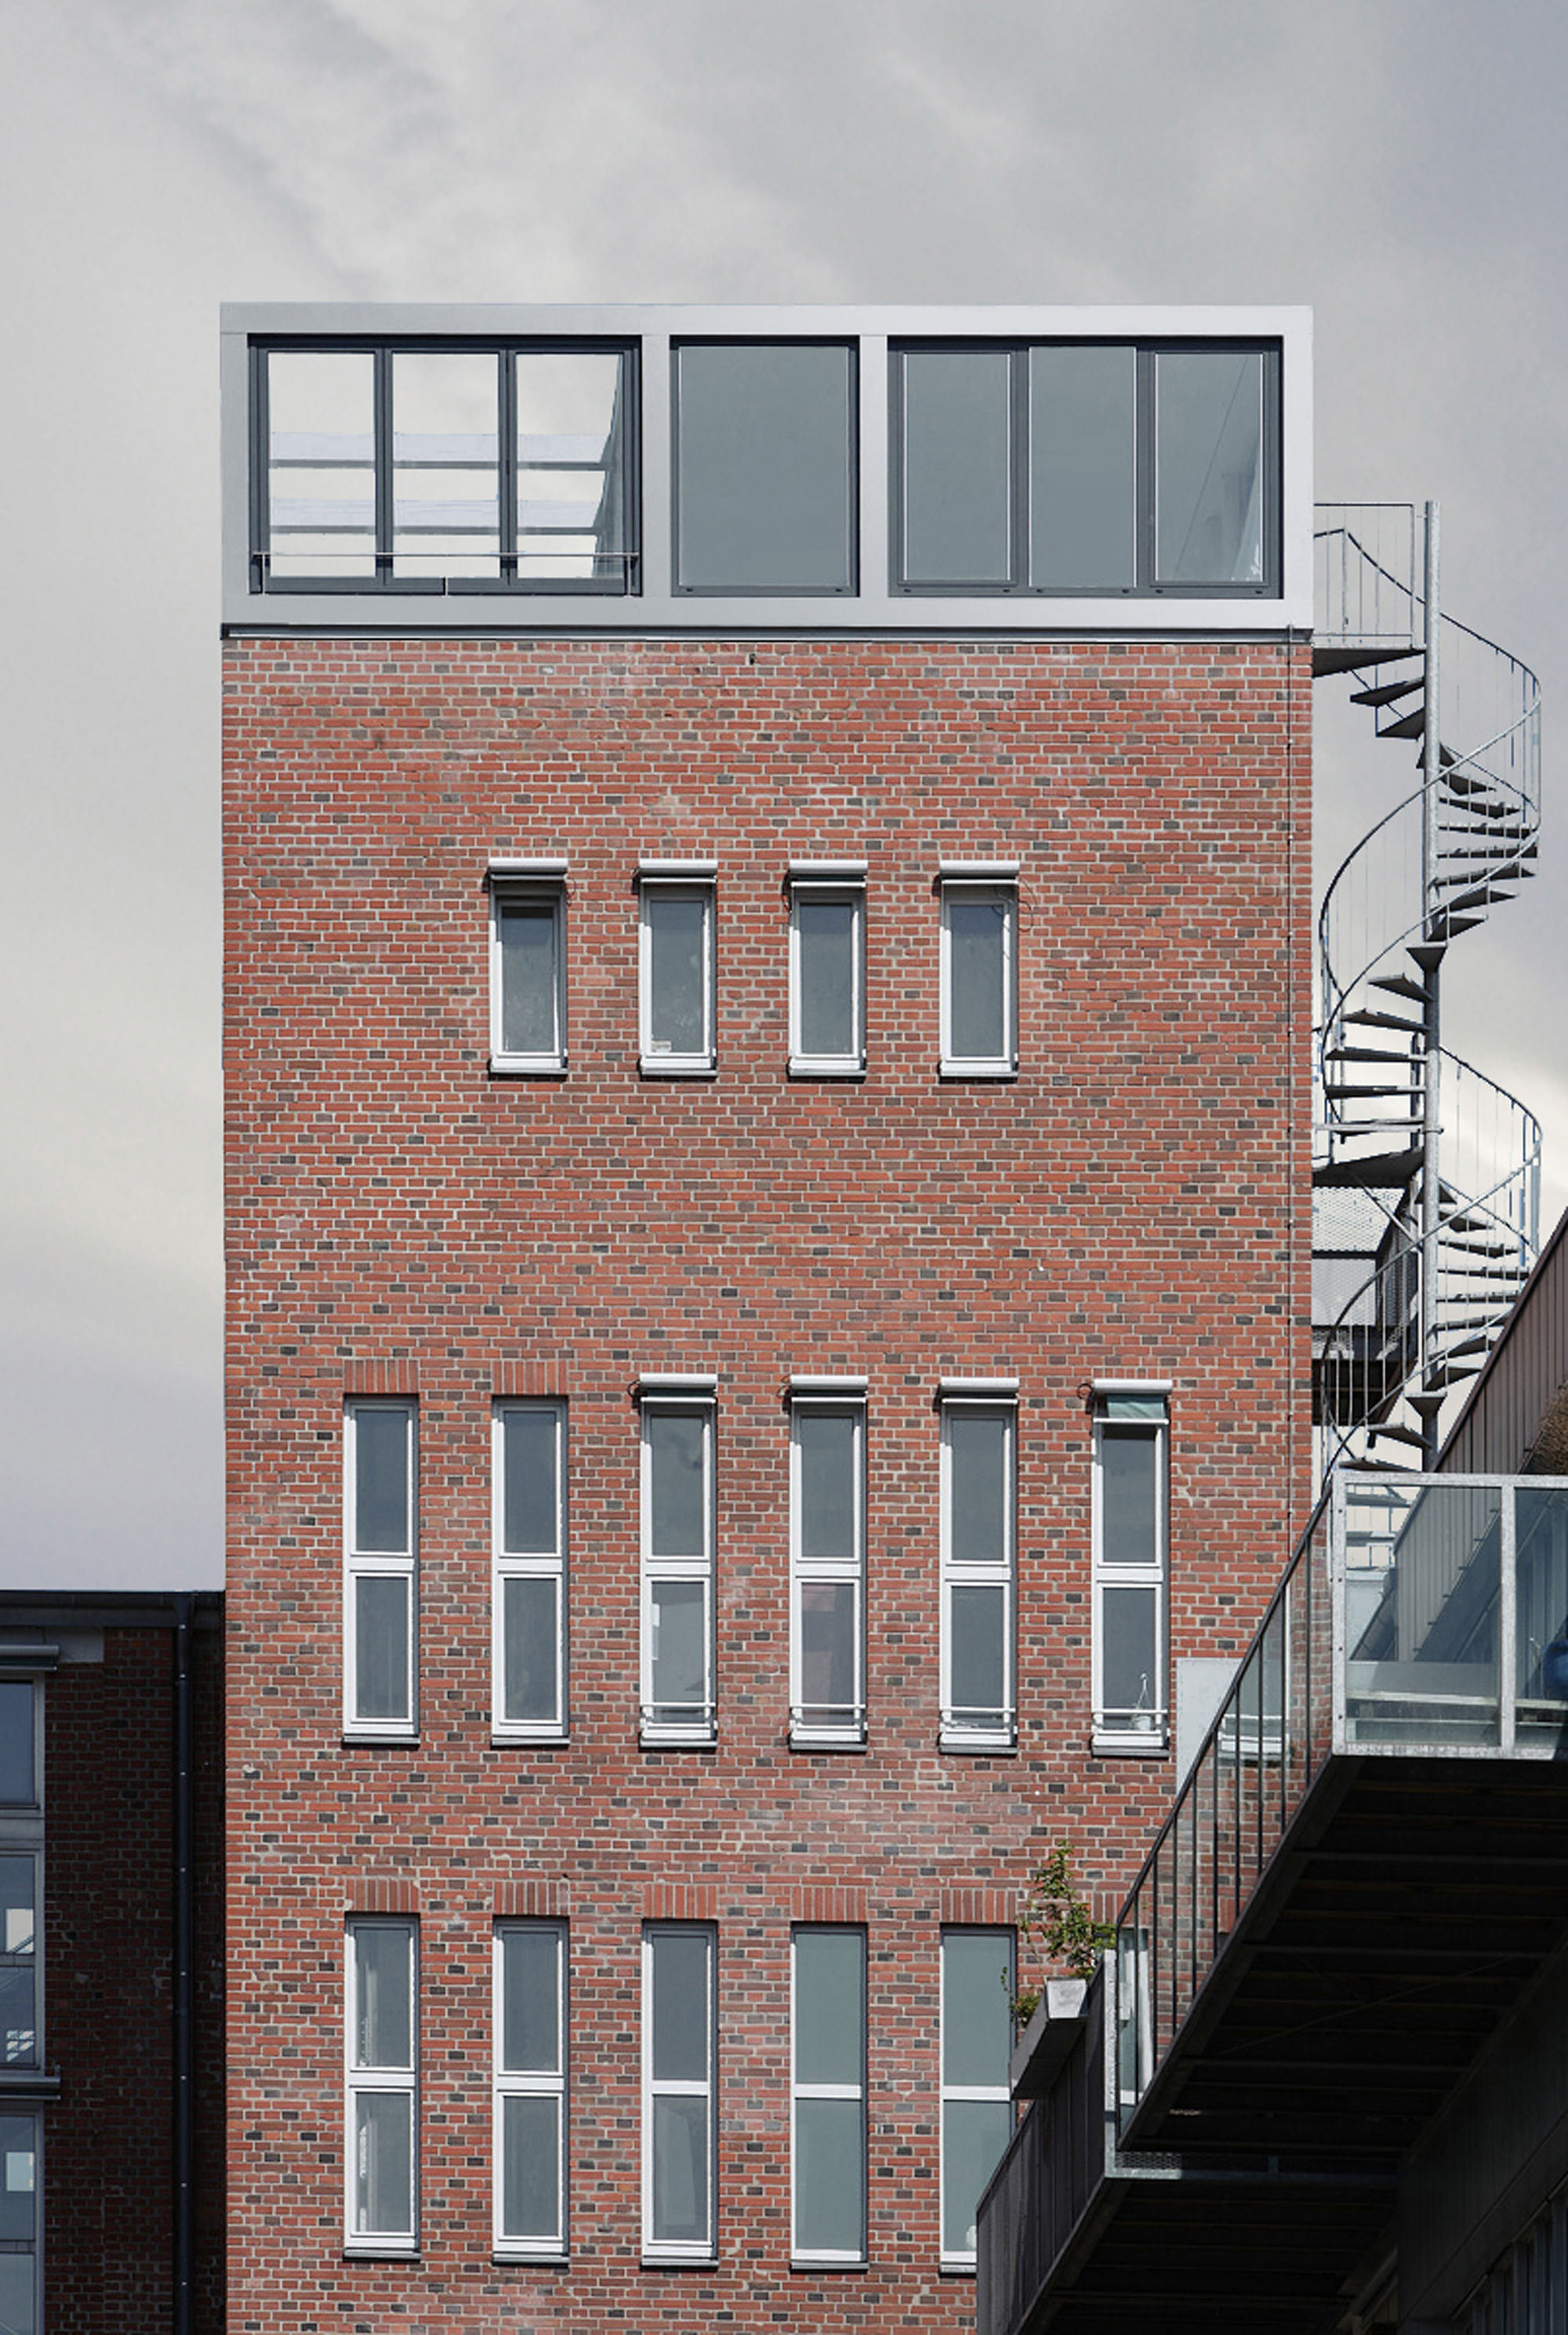 gallery of penthouse apartment in bielefeld architekten wannenmacher m ller 1. Black Bedroom Furniture Sets. Home Design Ideas